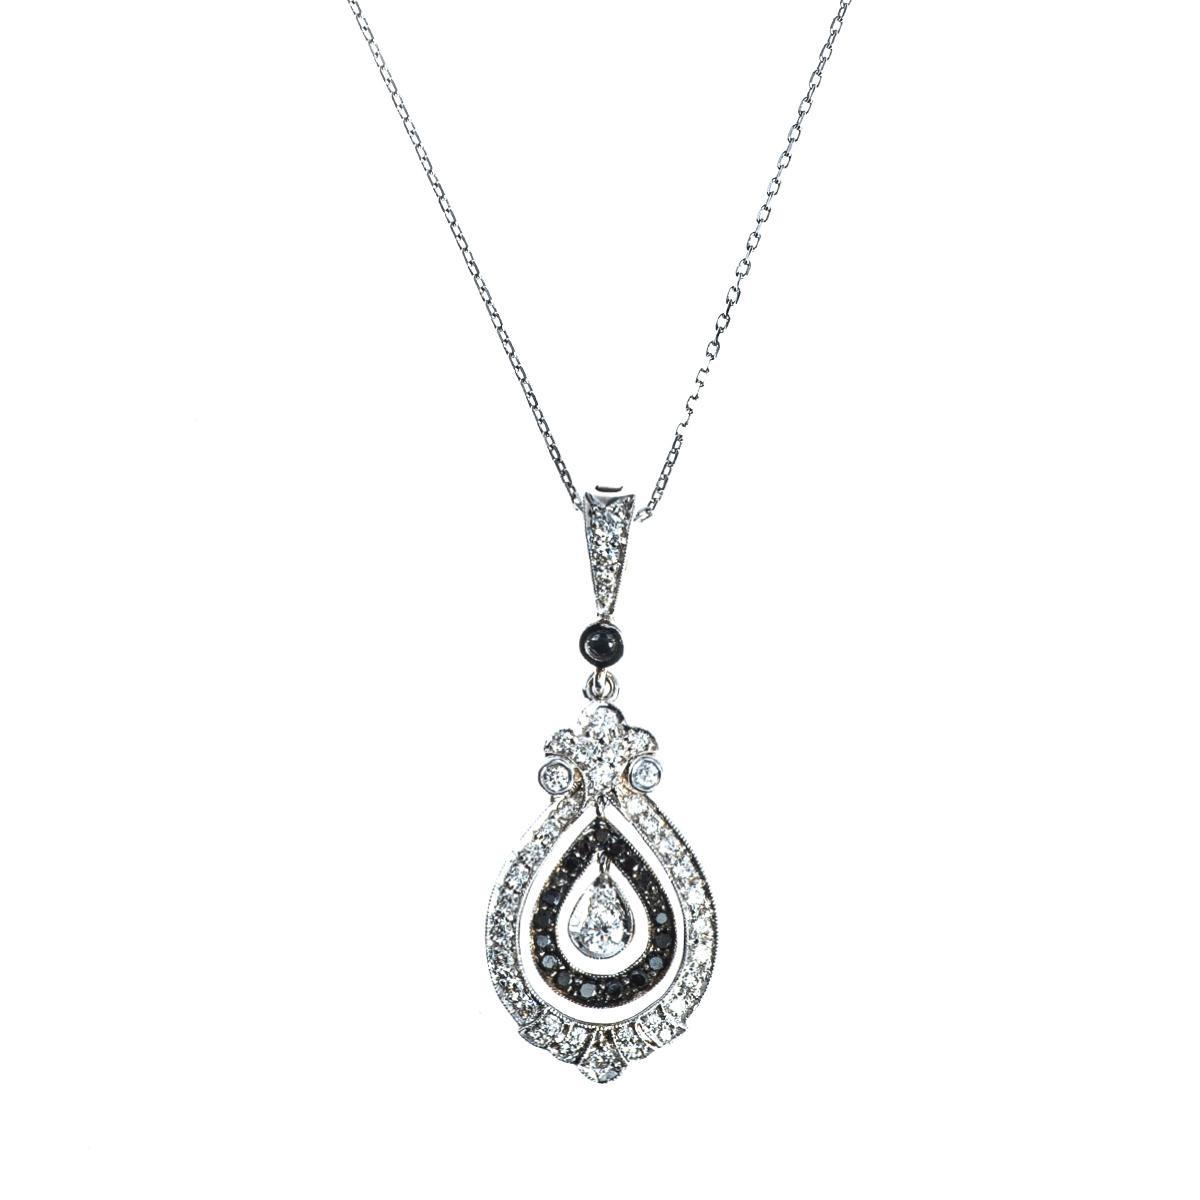 Vintage Penny Preville Black & White Diamond Pendant